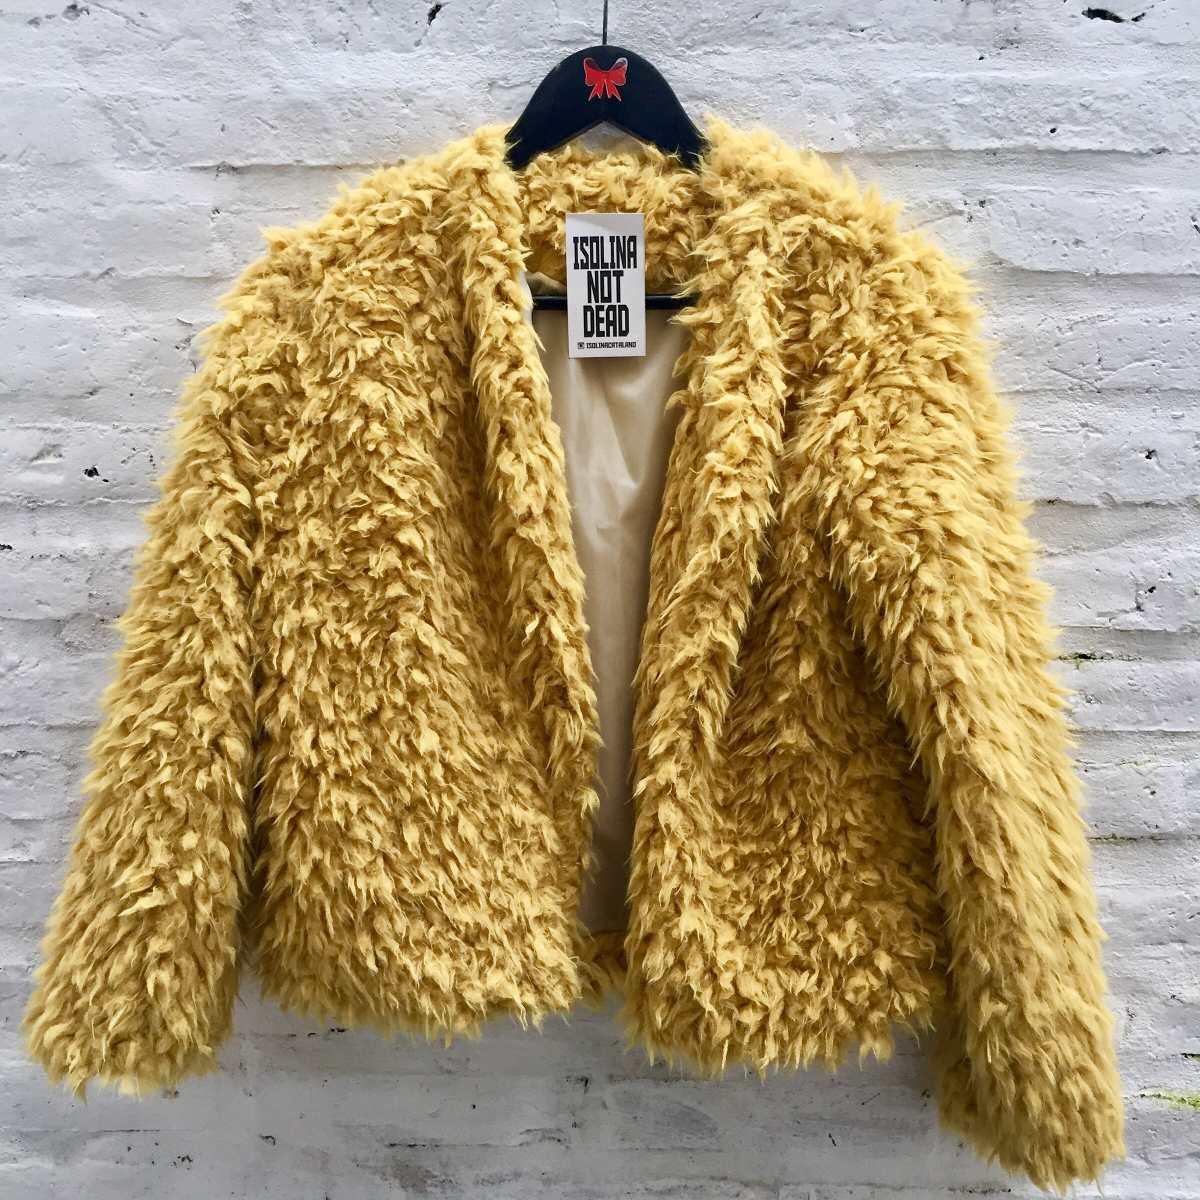 759ff0b0 tapado peludito mujer piel sintética abrigo moda invierno. Cargando zoom.